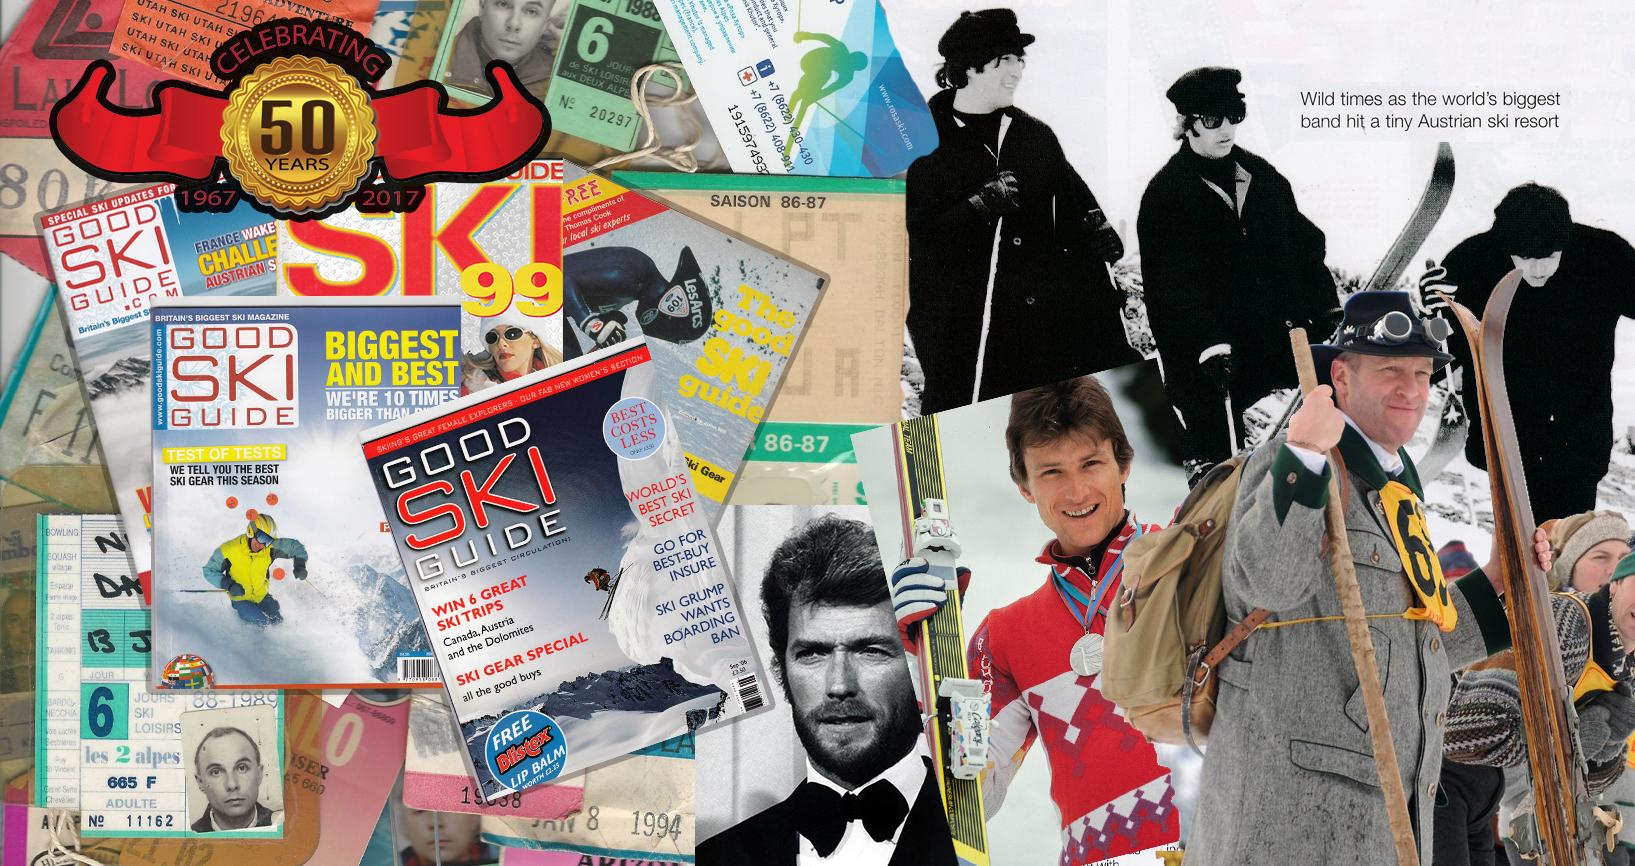 WAY WE USED TO SKI …50 years of The Good Ski Guide